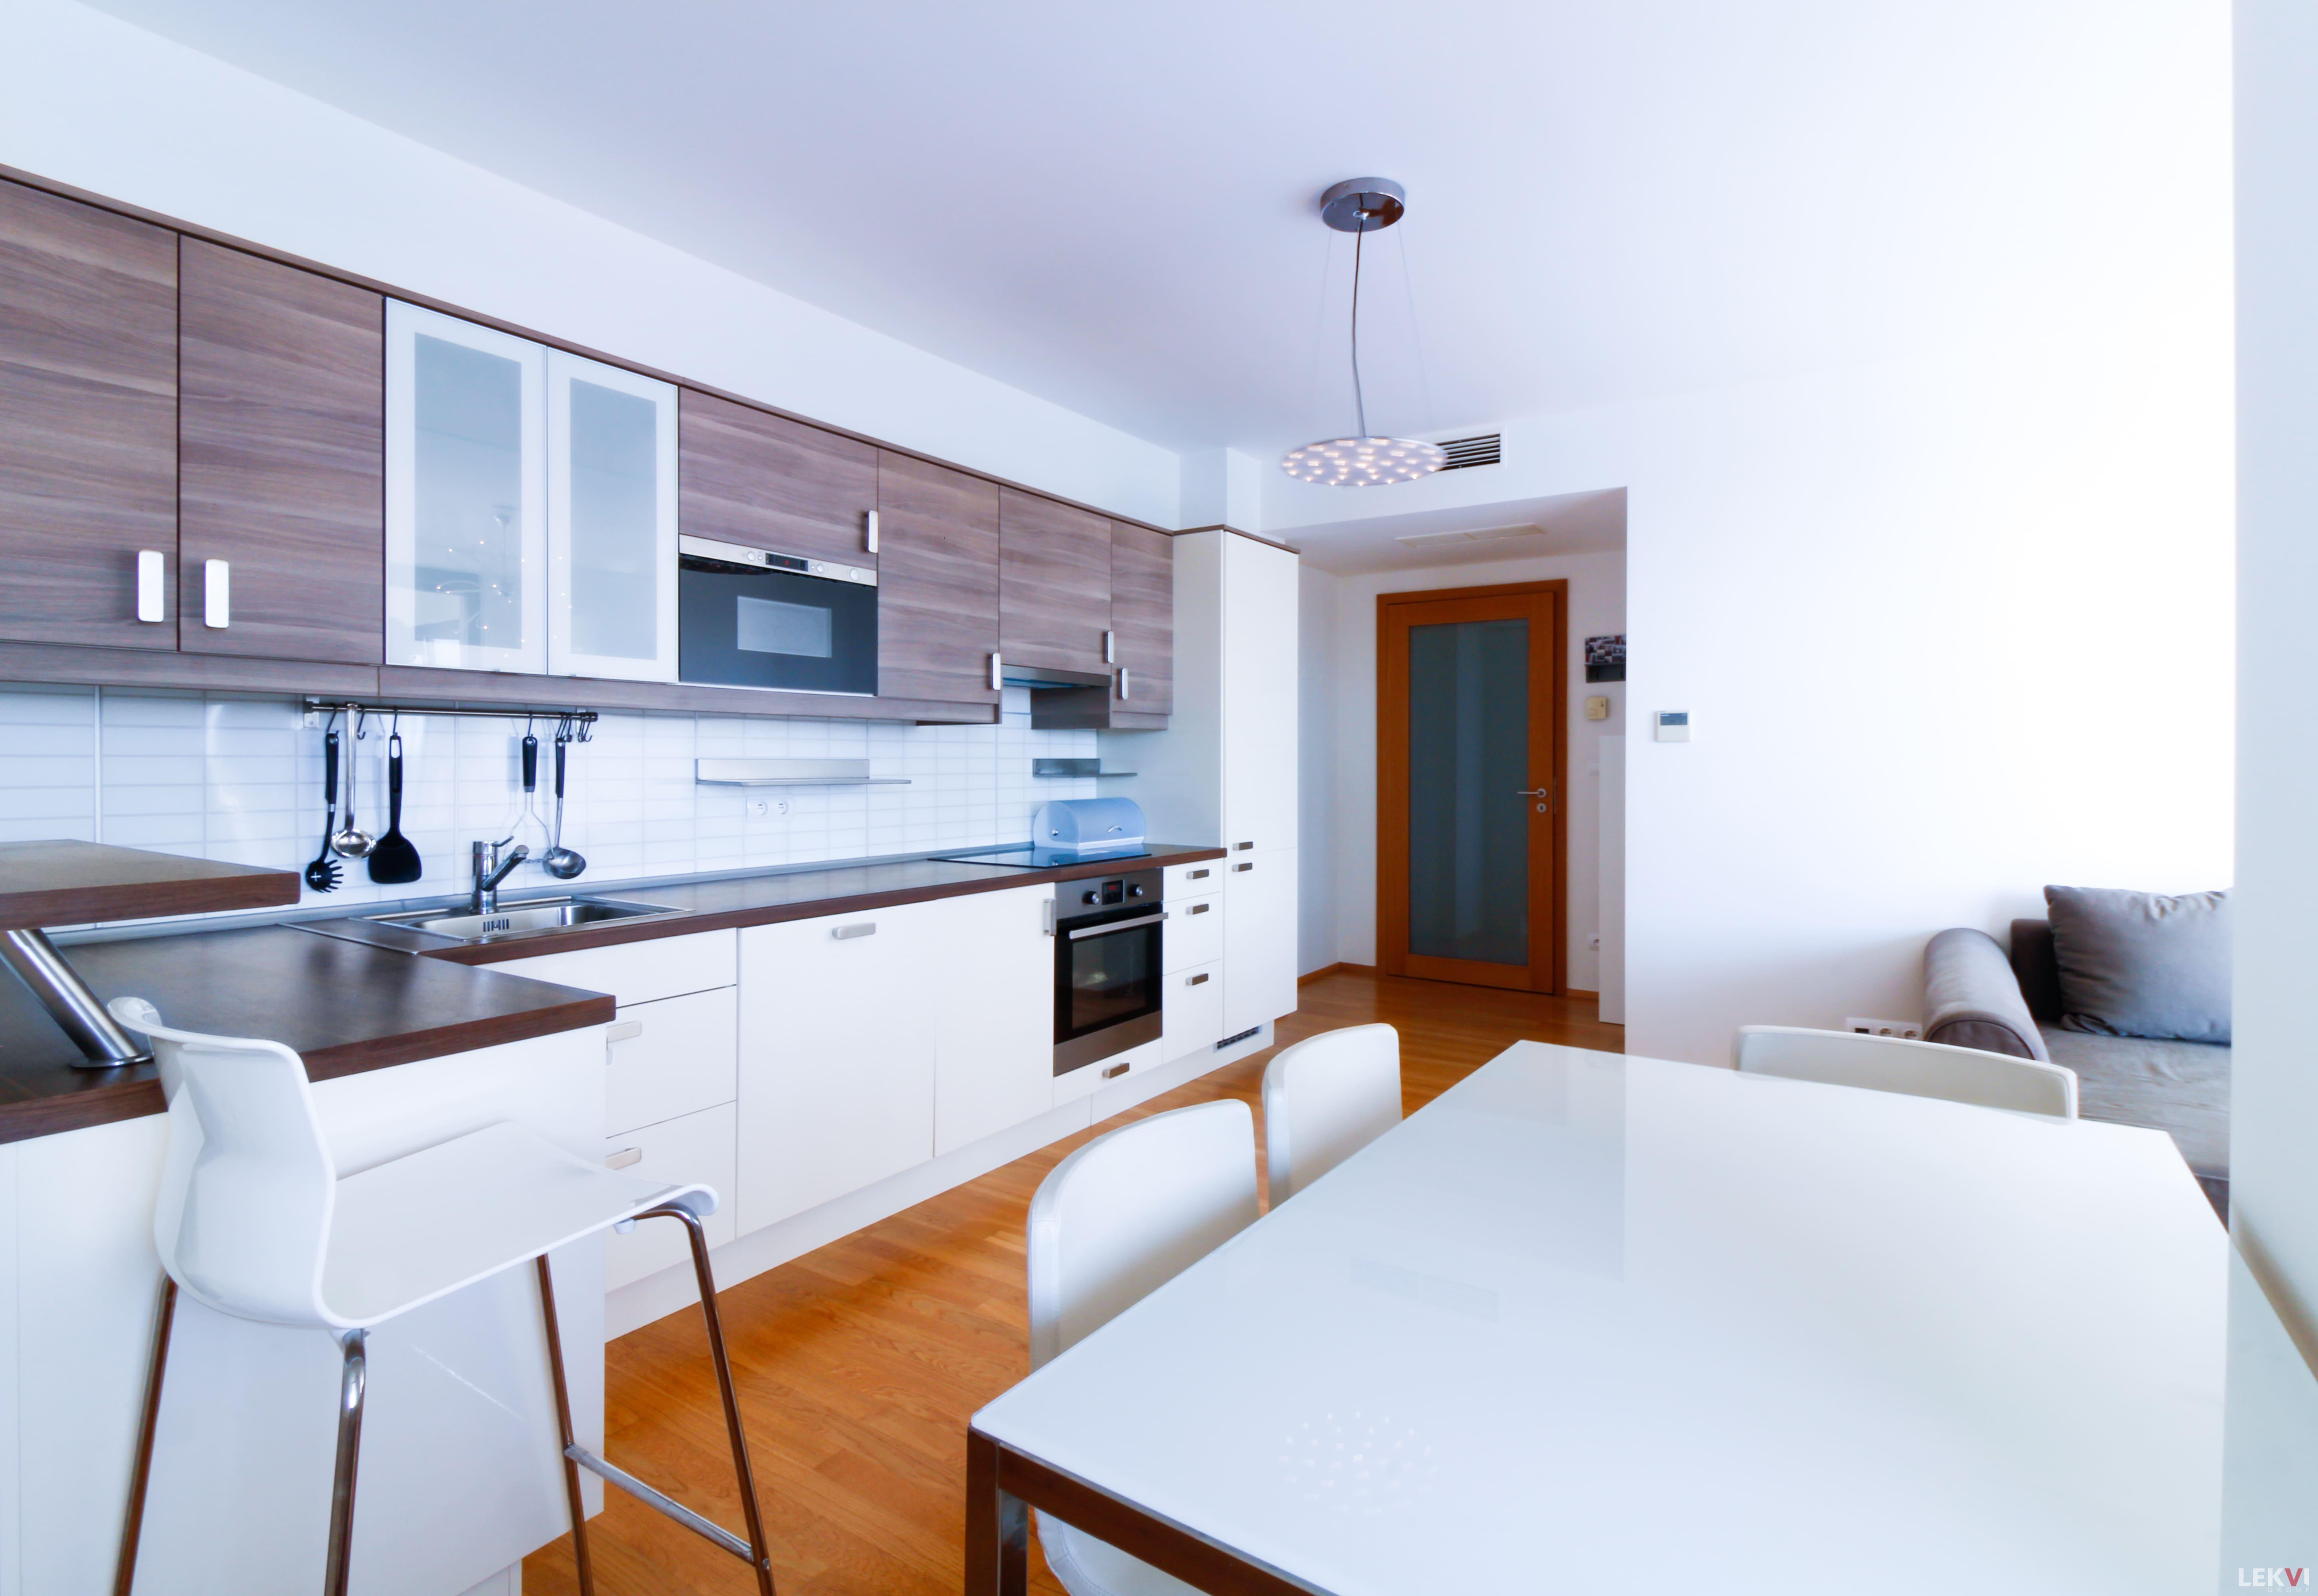 Pronájem bytu 2+kk, 70 m2 - Ke Kapslovně, Praha 3